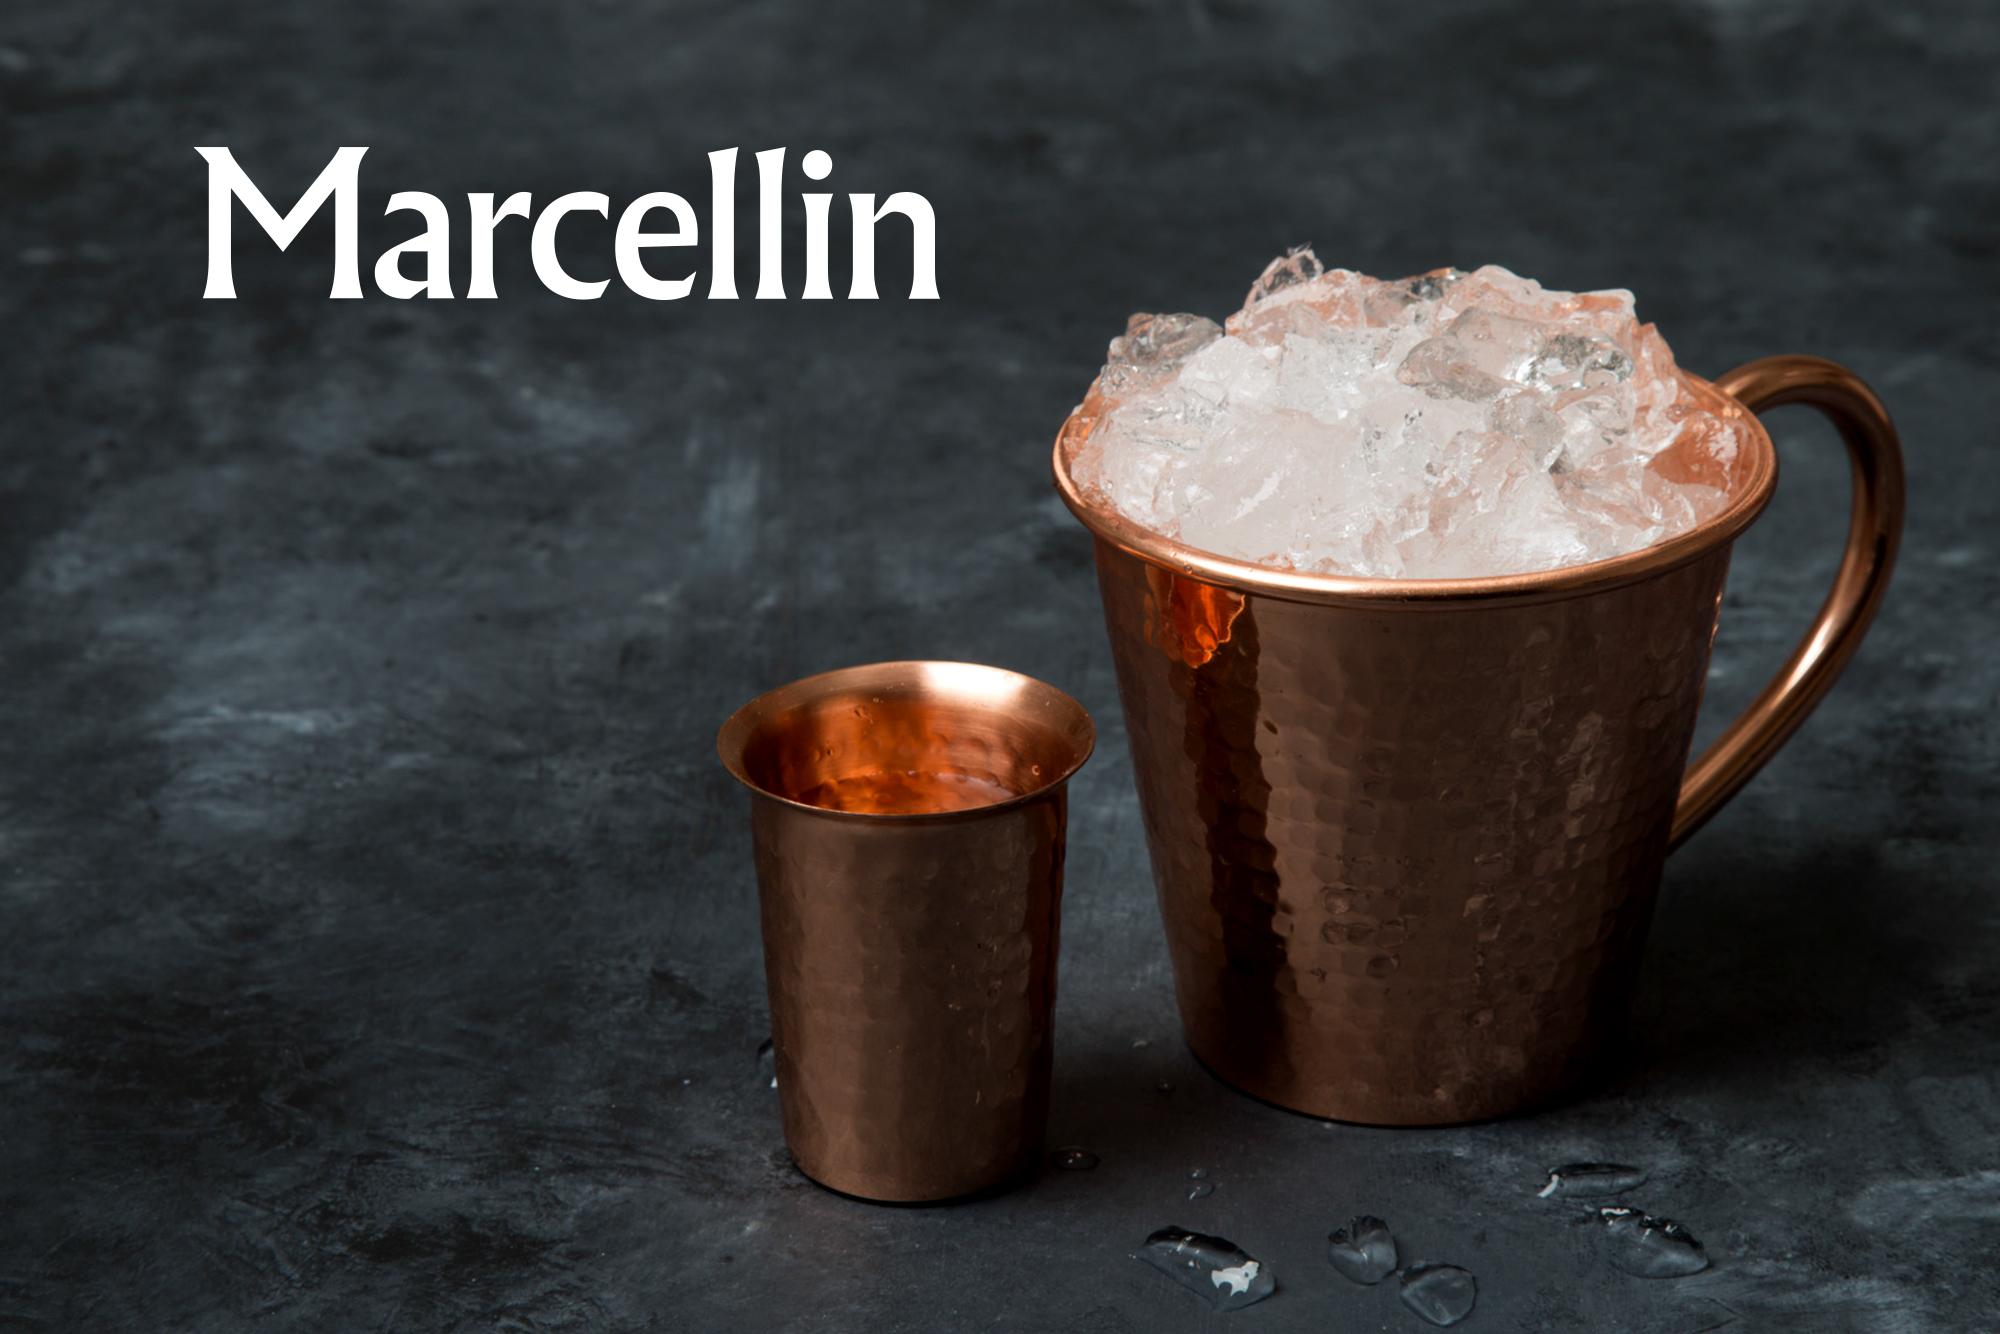 marcellin-2.jpg